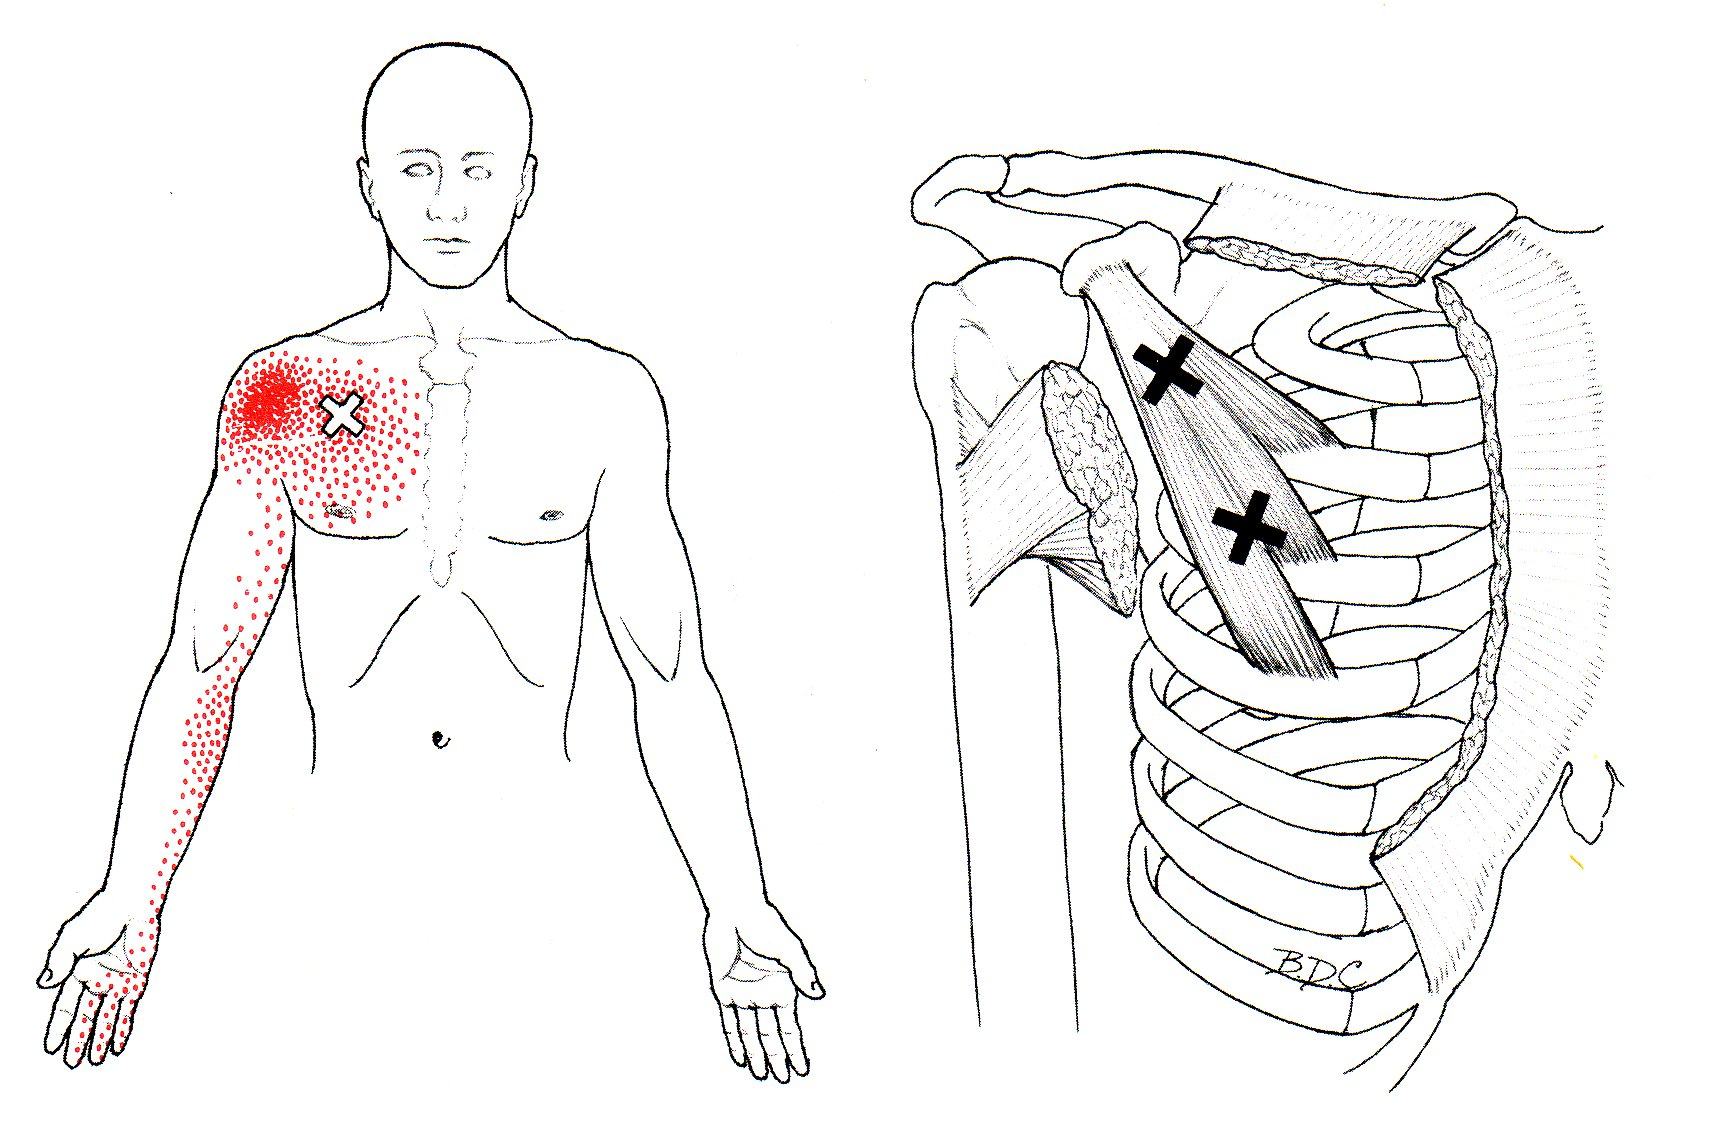 Hurne Chiropractic